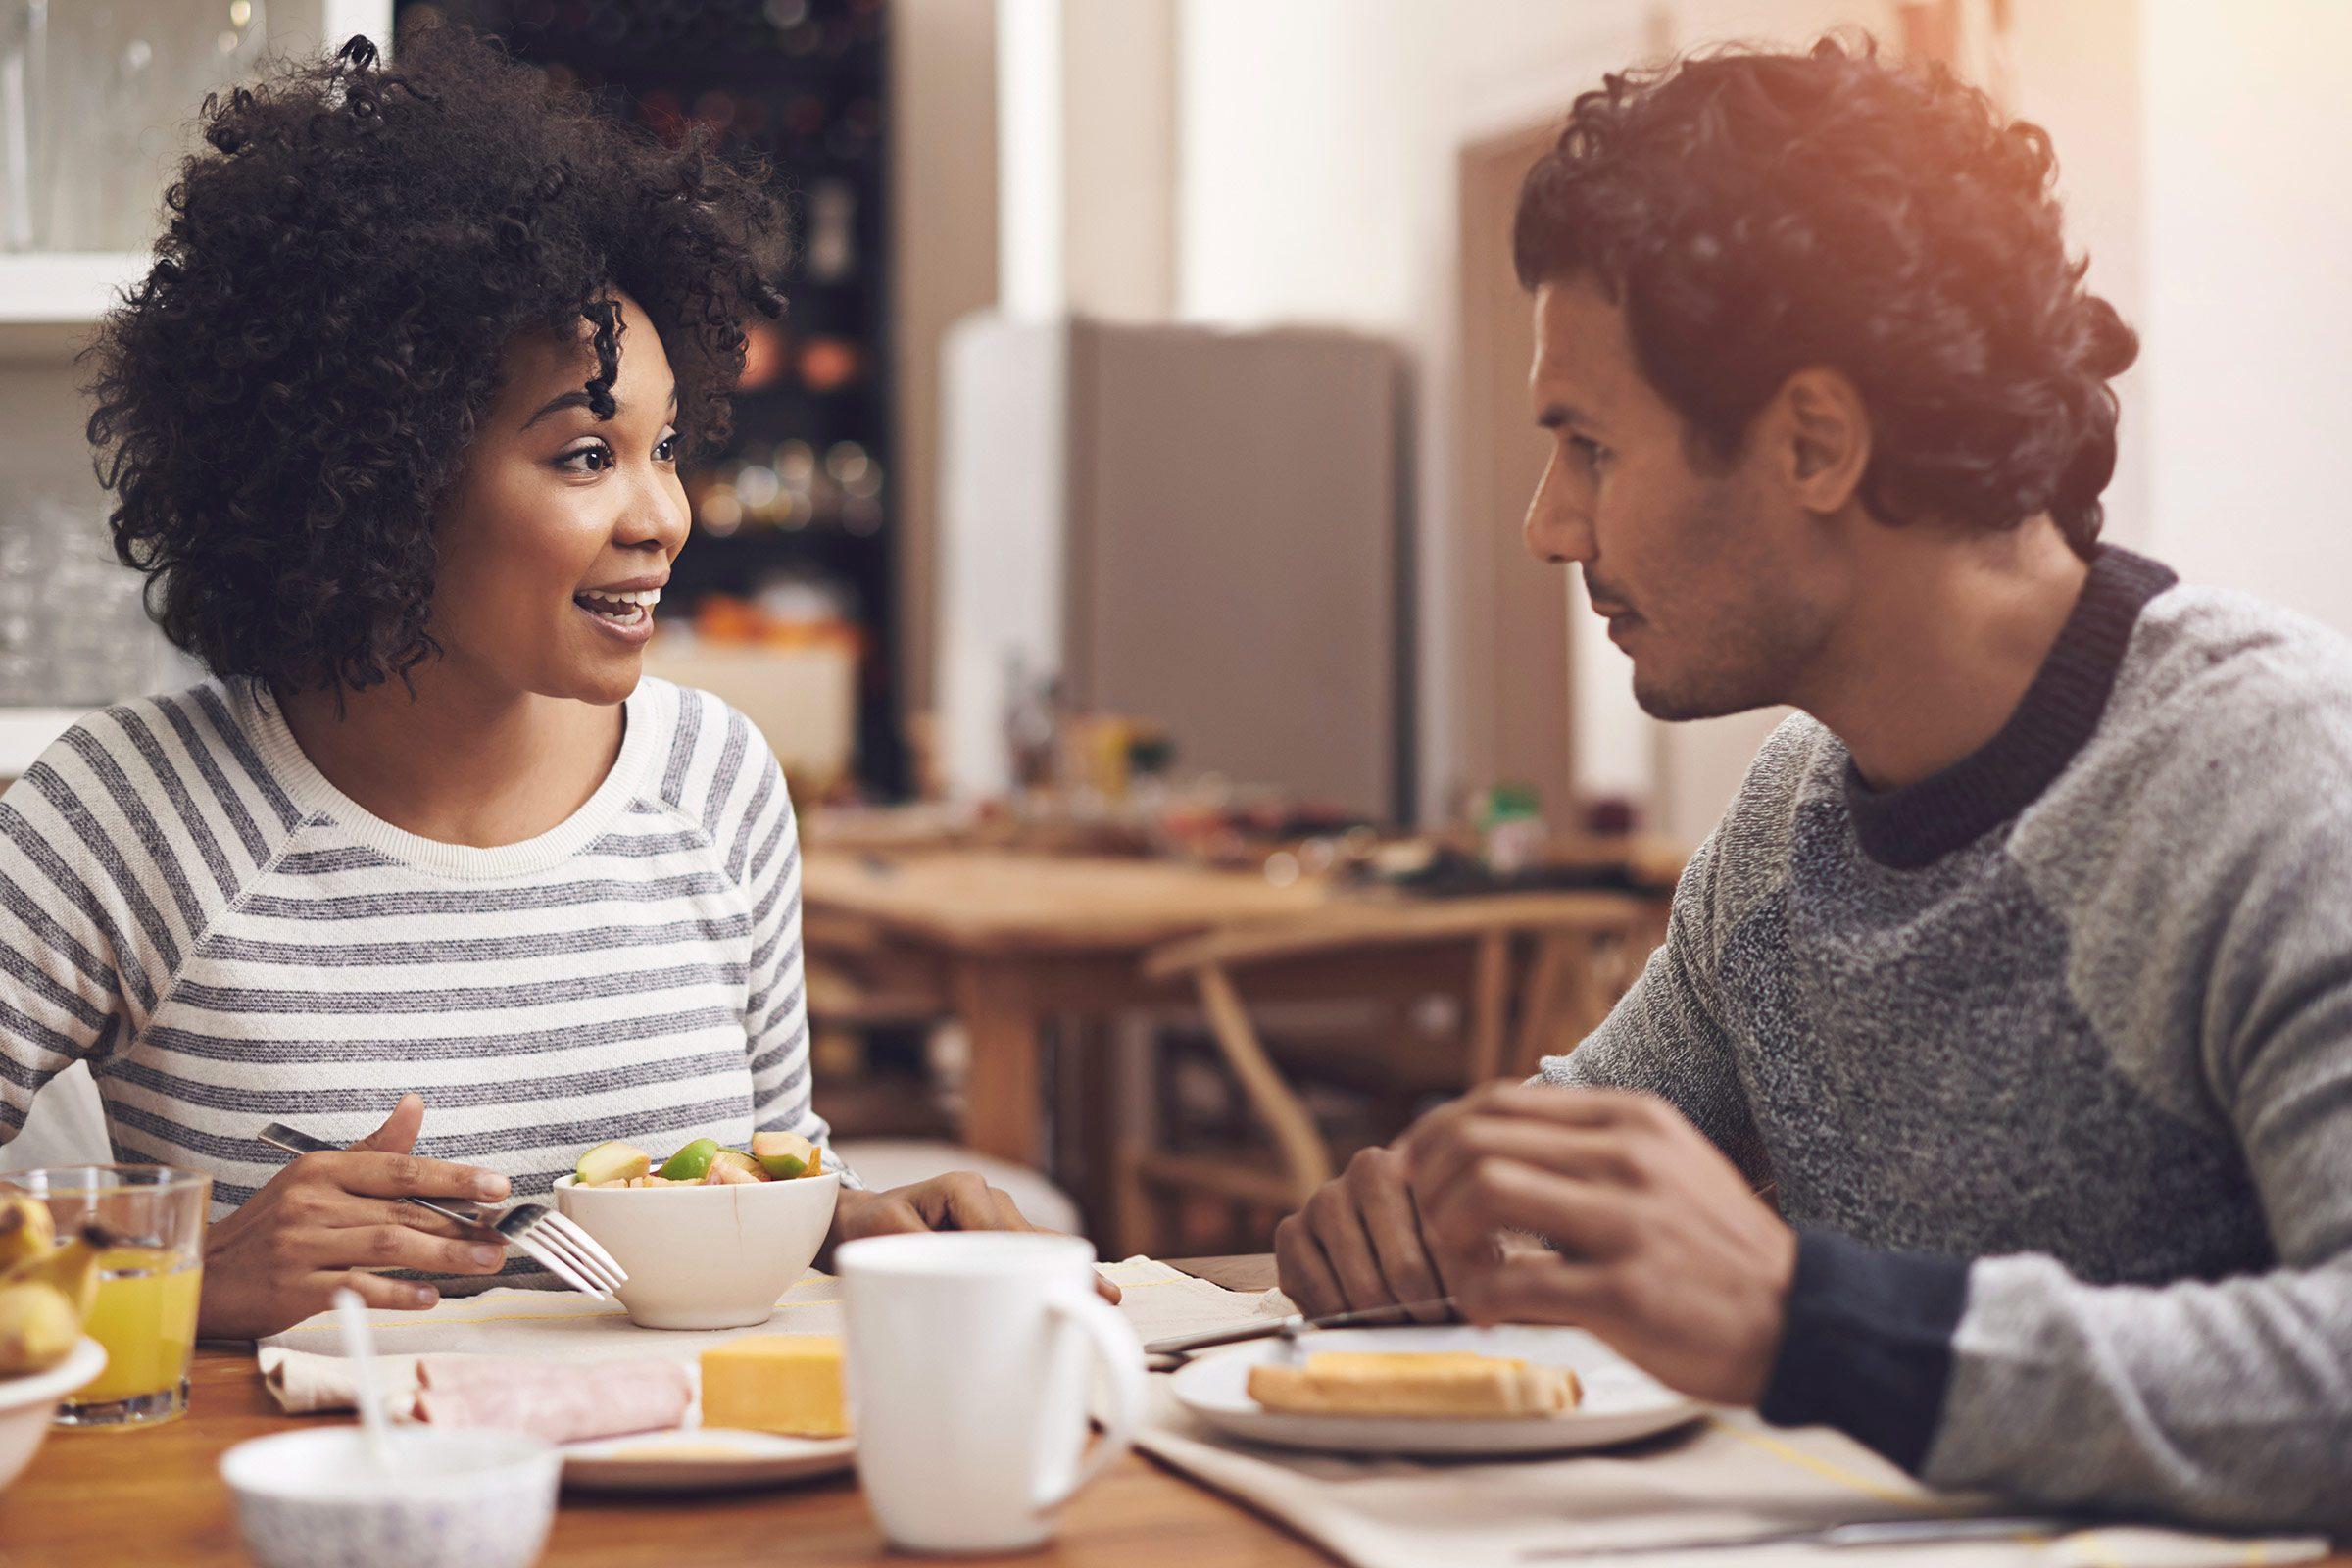 3. Listen empathetically to your spouse.